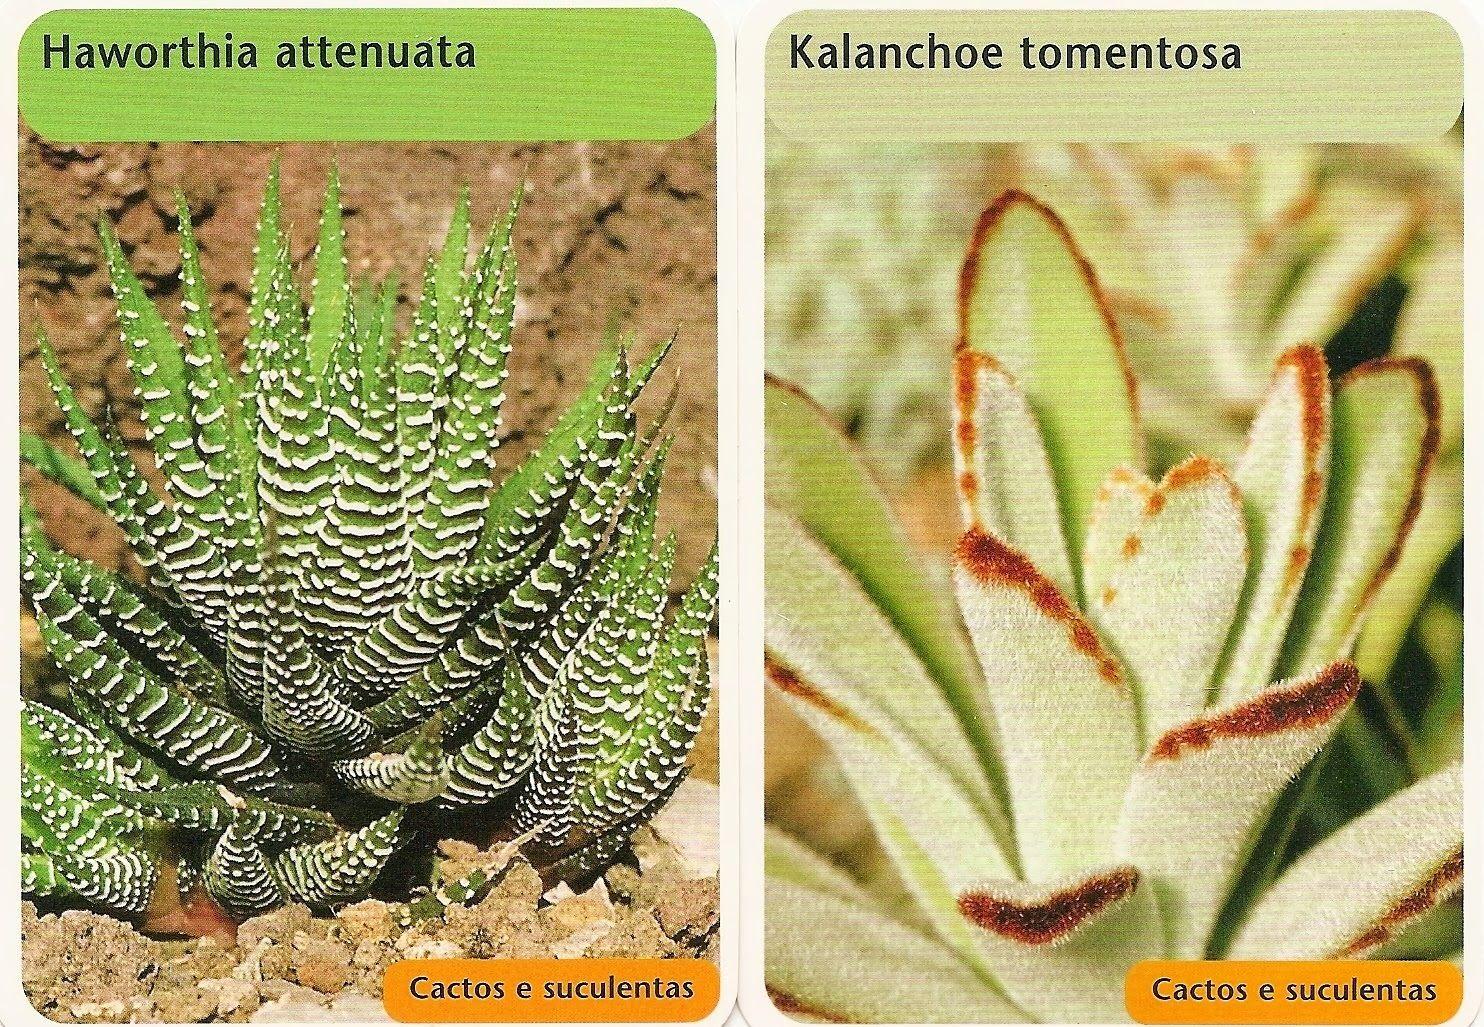 Duas plantas por dia - Haworthia attenuata e Kalanchoe tomentosa, caracteristicas enmodo de cultivo.